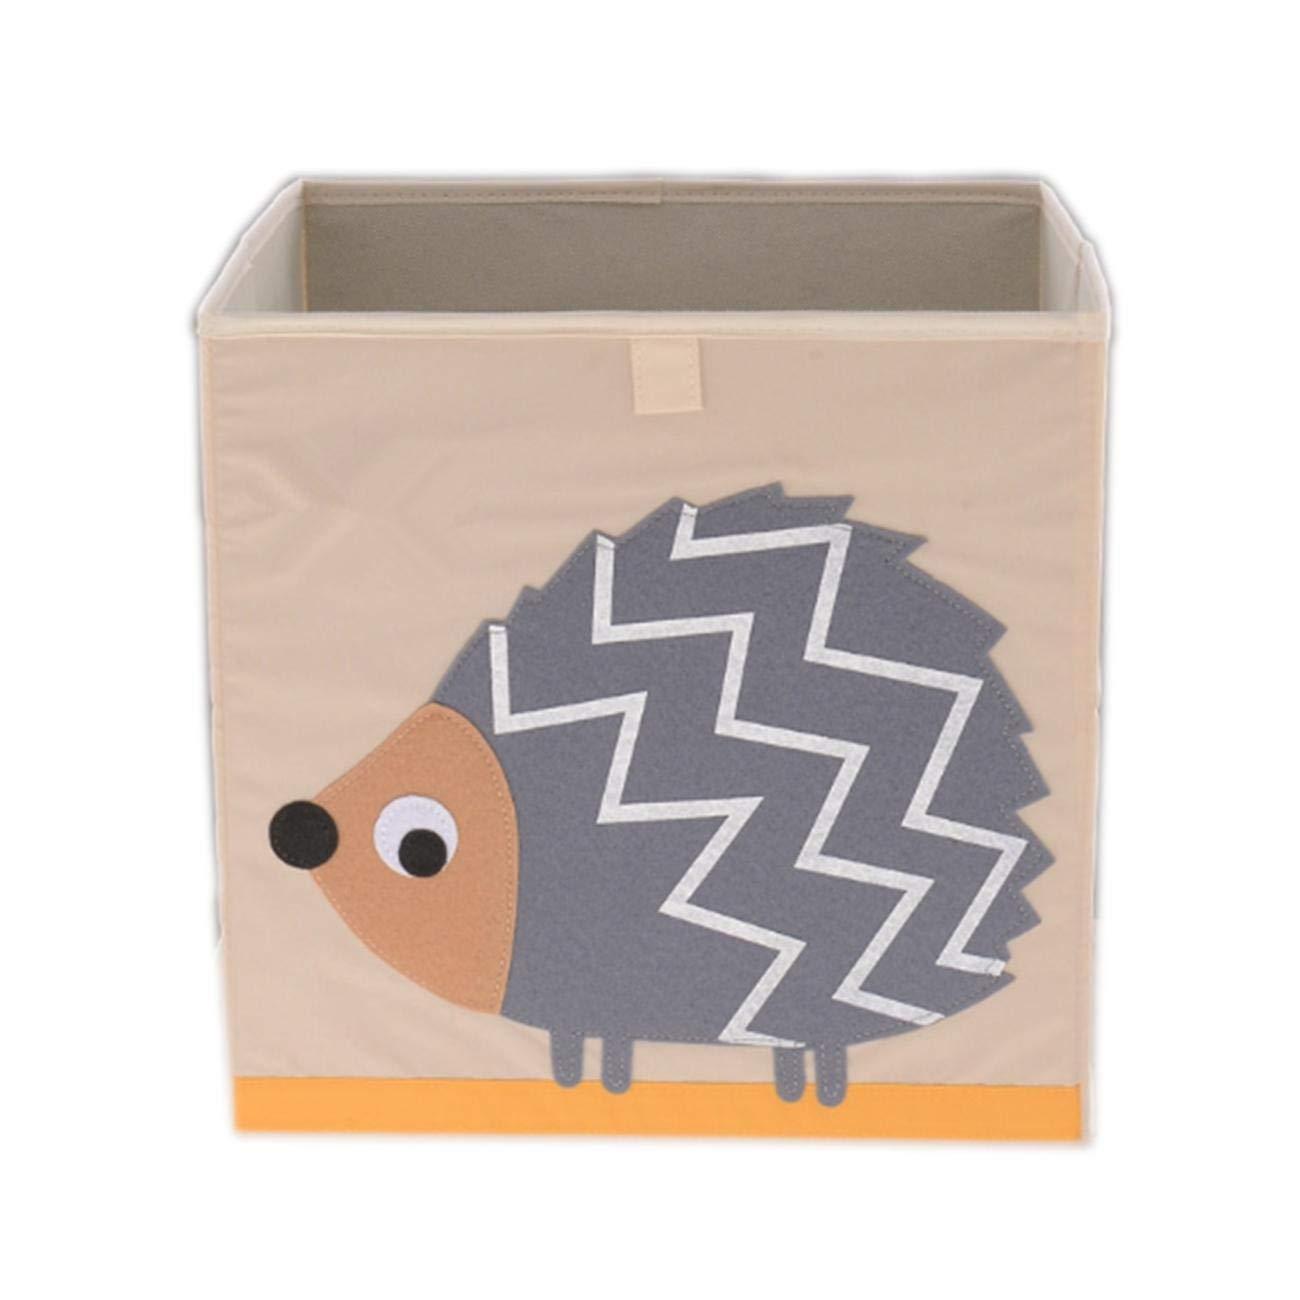 Luxuglow Cube Storage Box Collapsible Storage Cube Bin Canvas Cloth Storage Bin Toy Storage Box Foldable Fabric Storage Organizer Great for Nursery, Bedroom, Closet, Home Organization (Hedgehog)